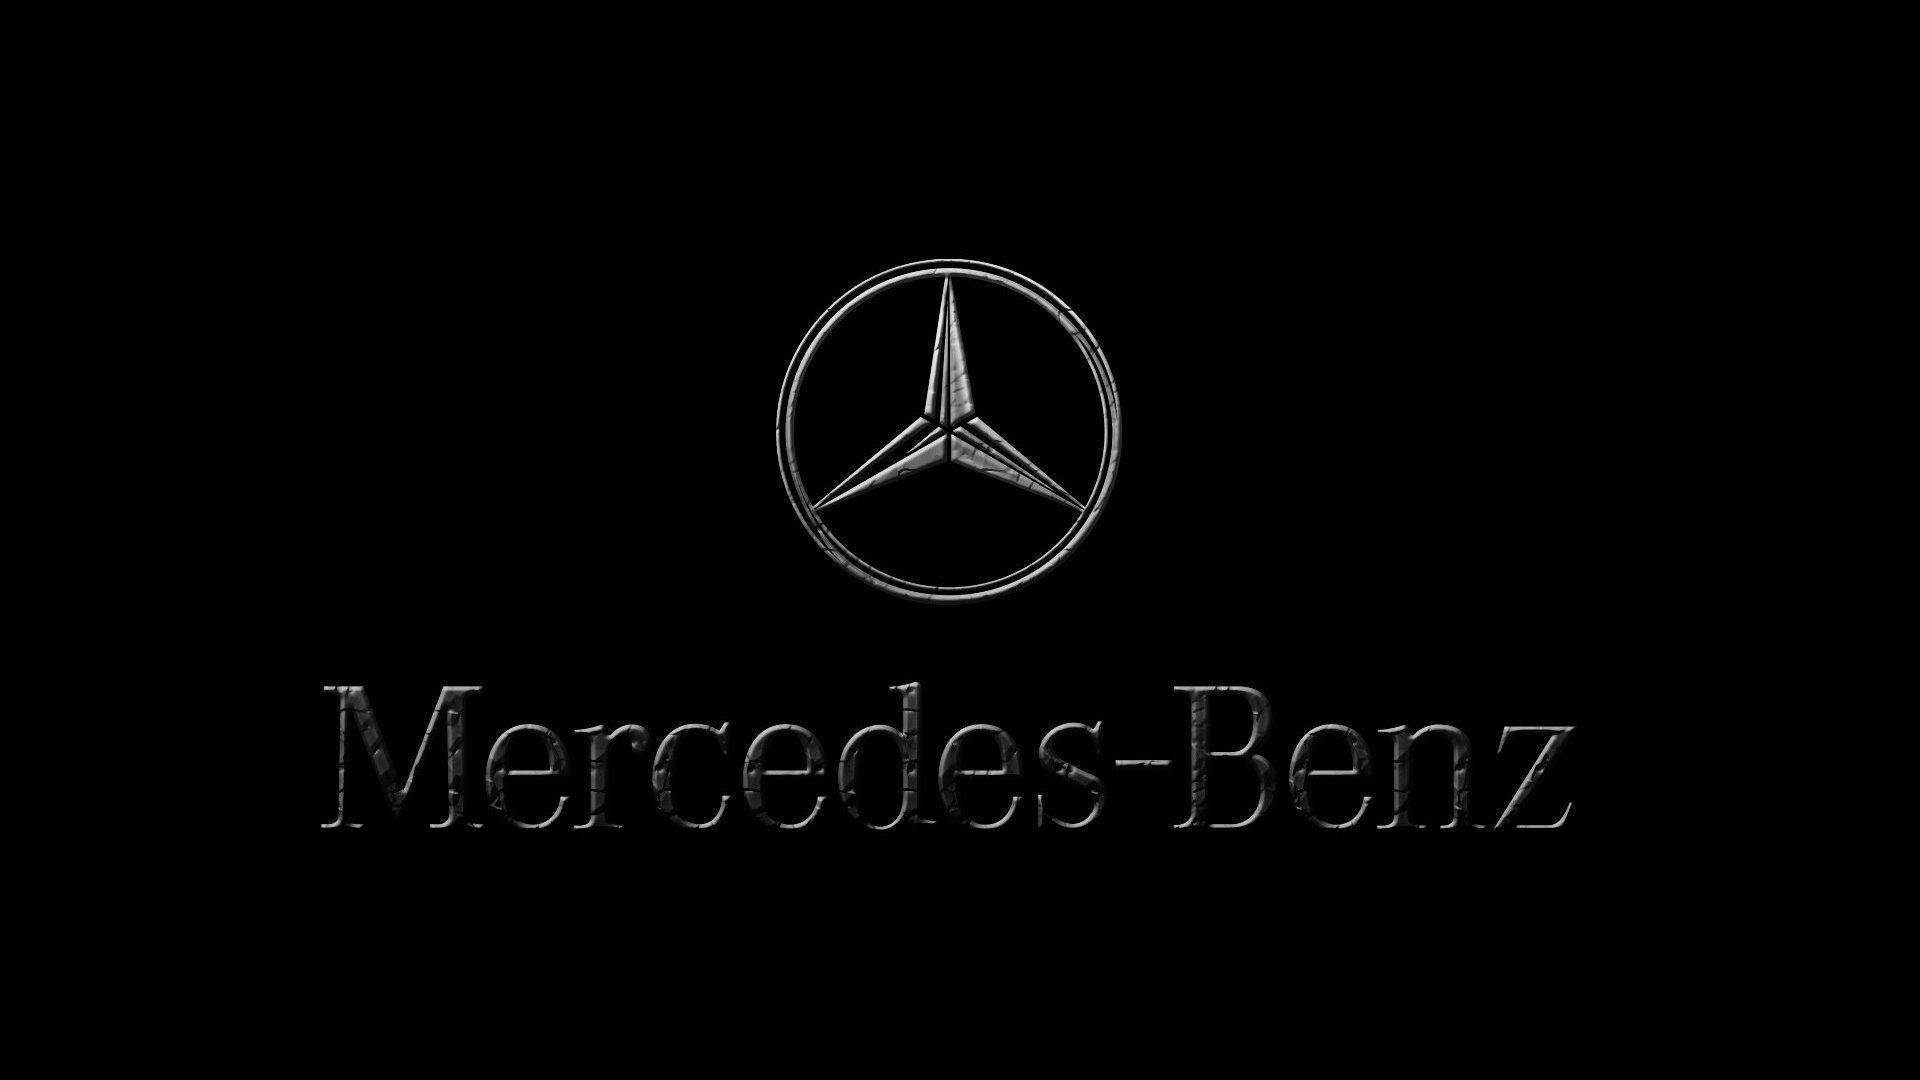 Mercedes Benz Logo Wallpapers Top Free Mercedes Benz Logo